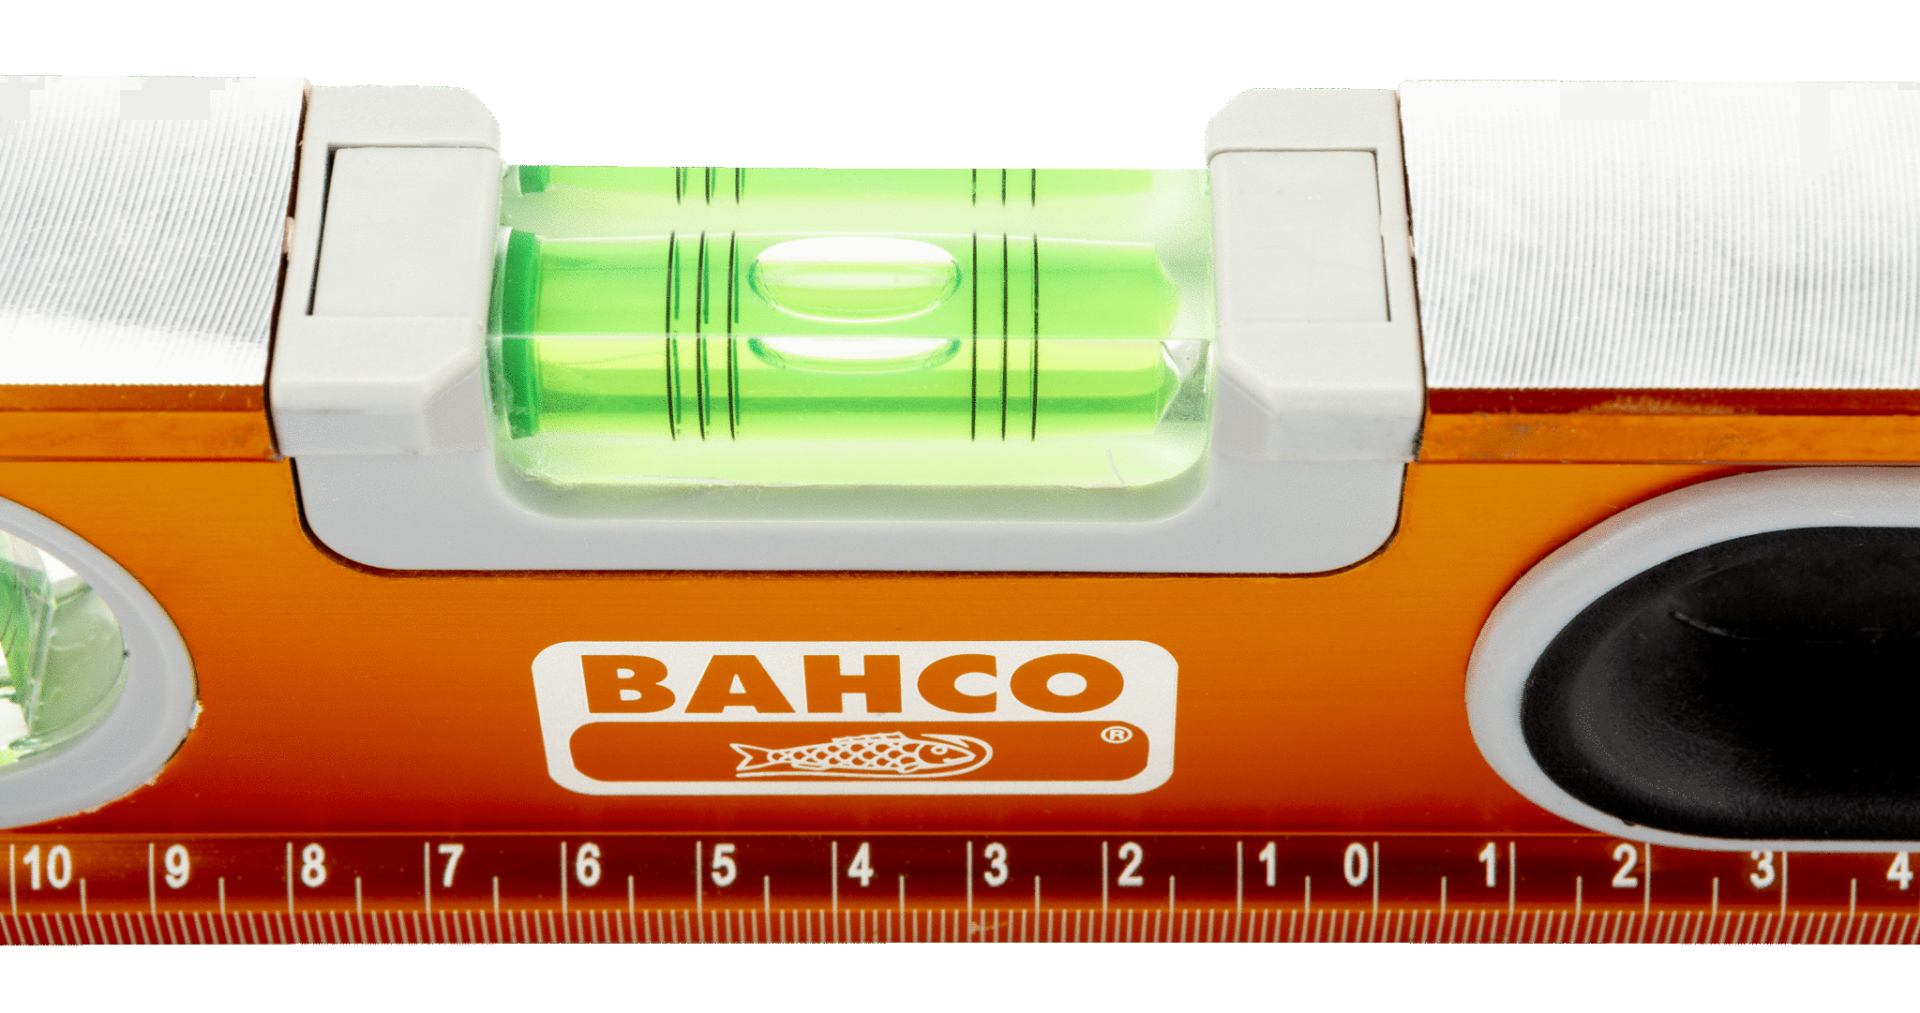 Poziomica 800 mm aluminiowa, anodowana Bahco (nr kat. 466-800)